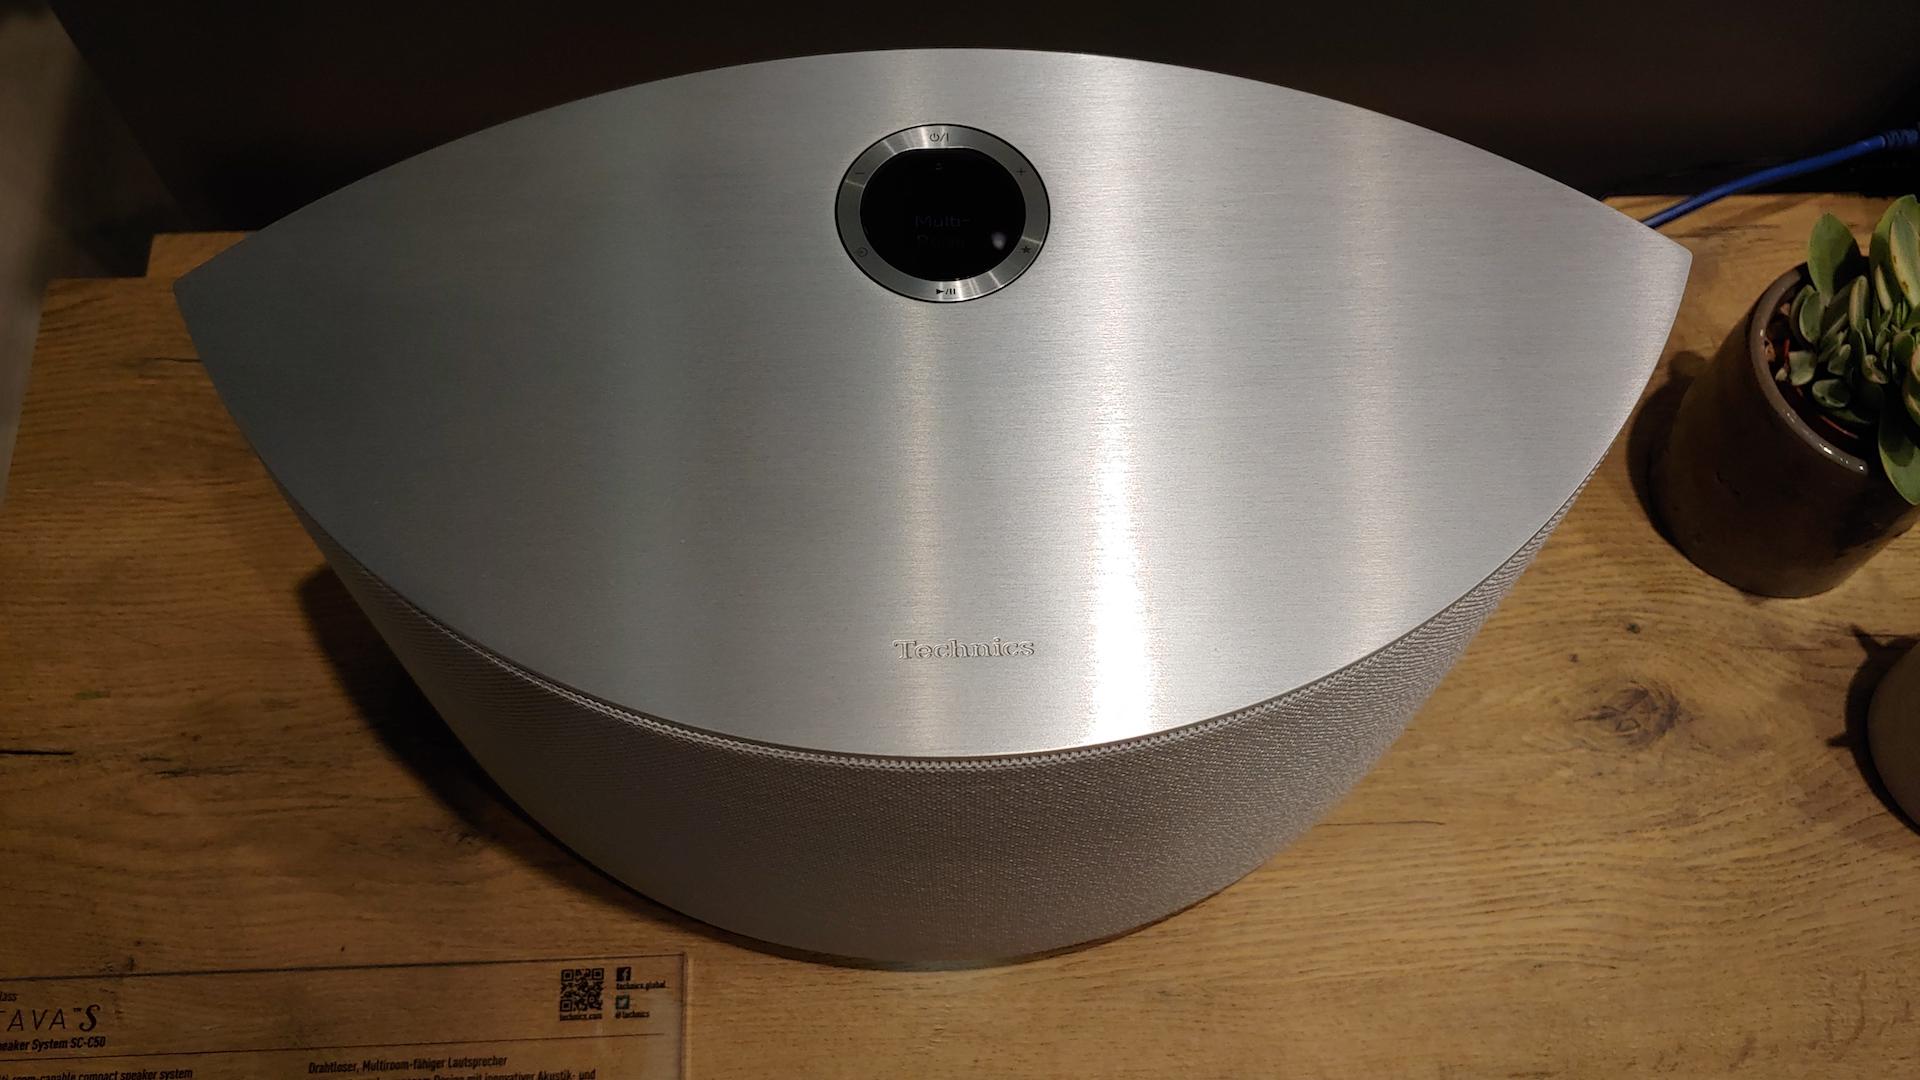 Take a peek at Technics' futuristic Ottava S SC-C50 wireless Chromecast speaker